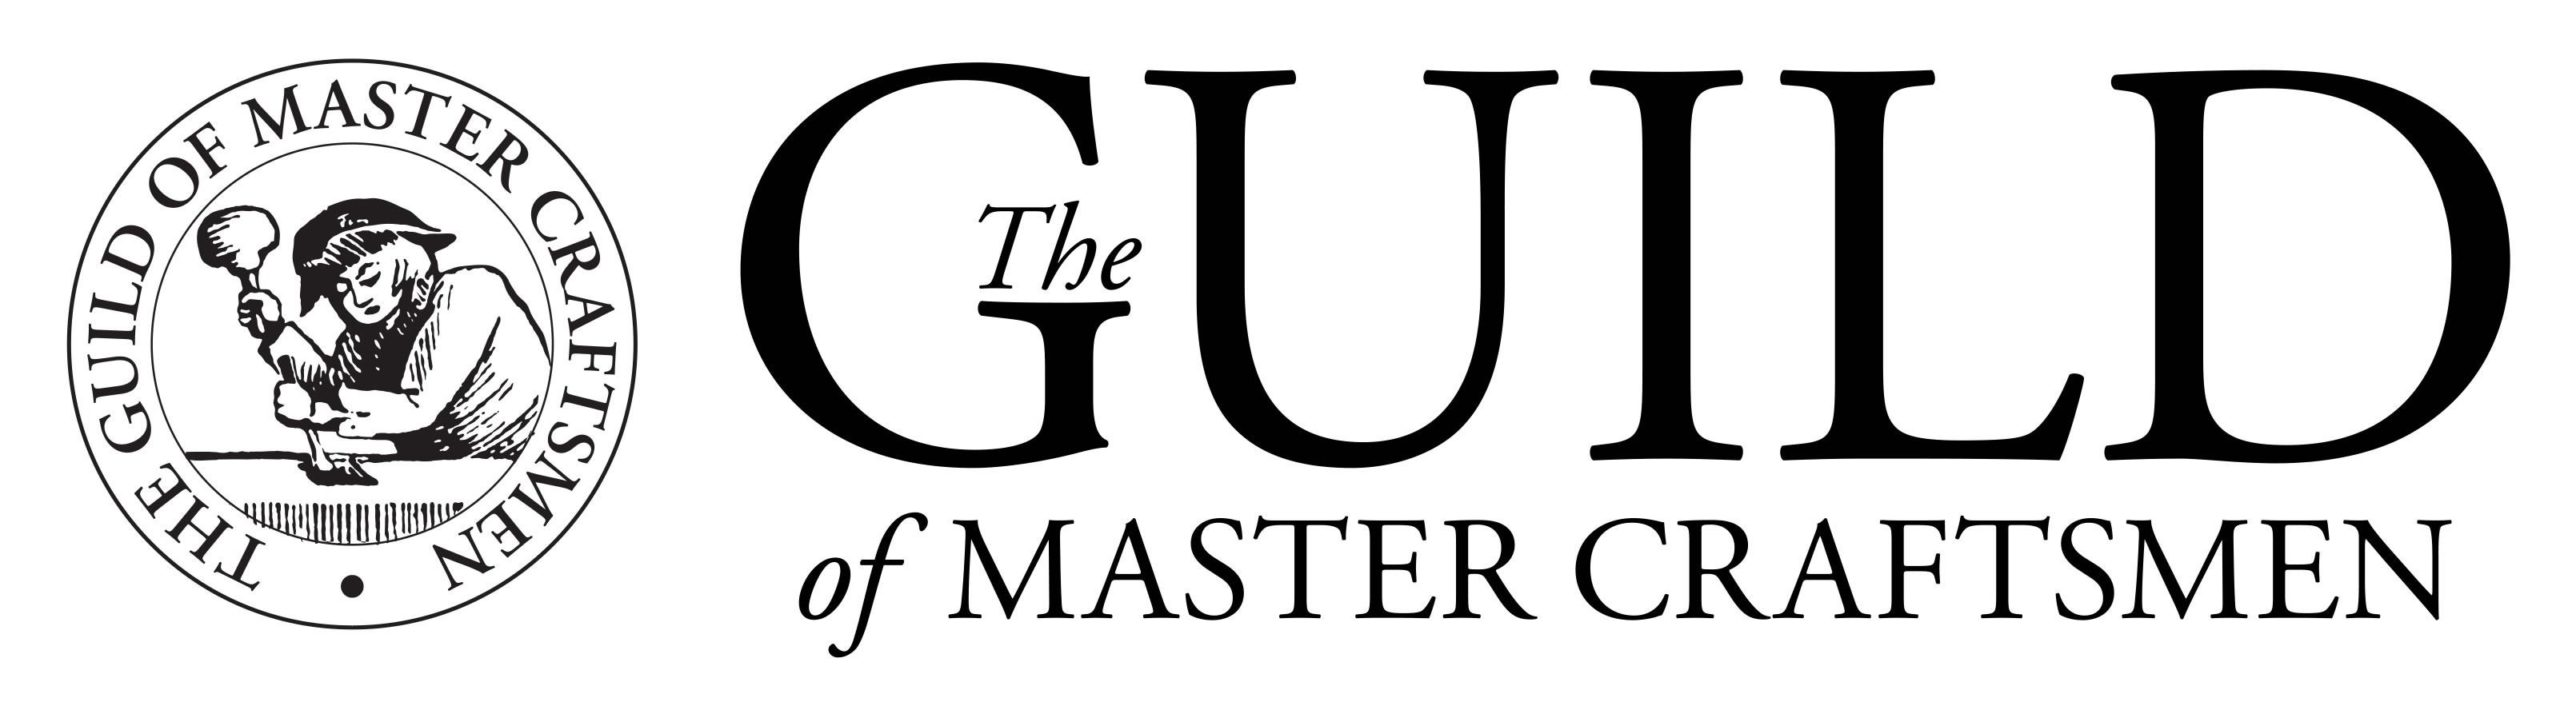 Landmark Walling Guild of master Craftsmen